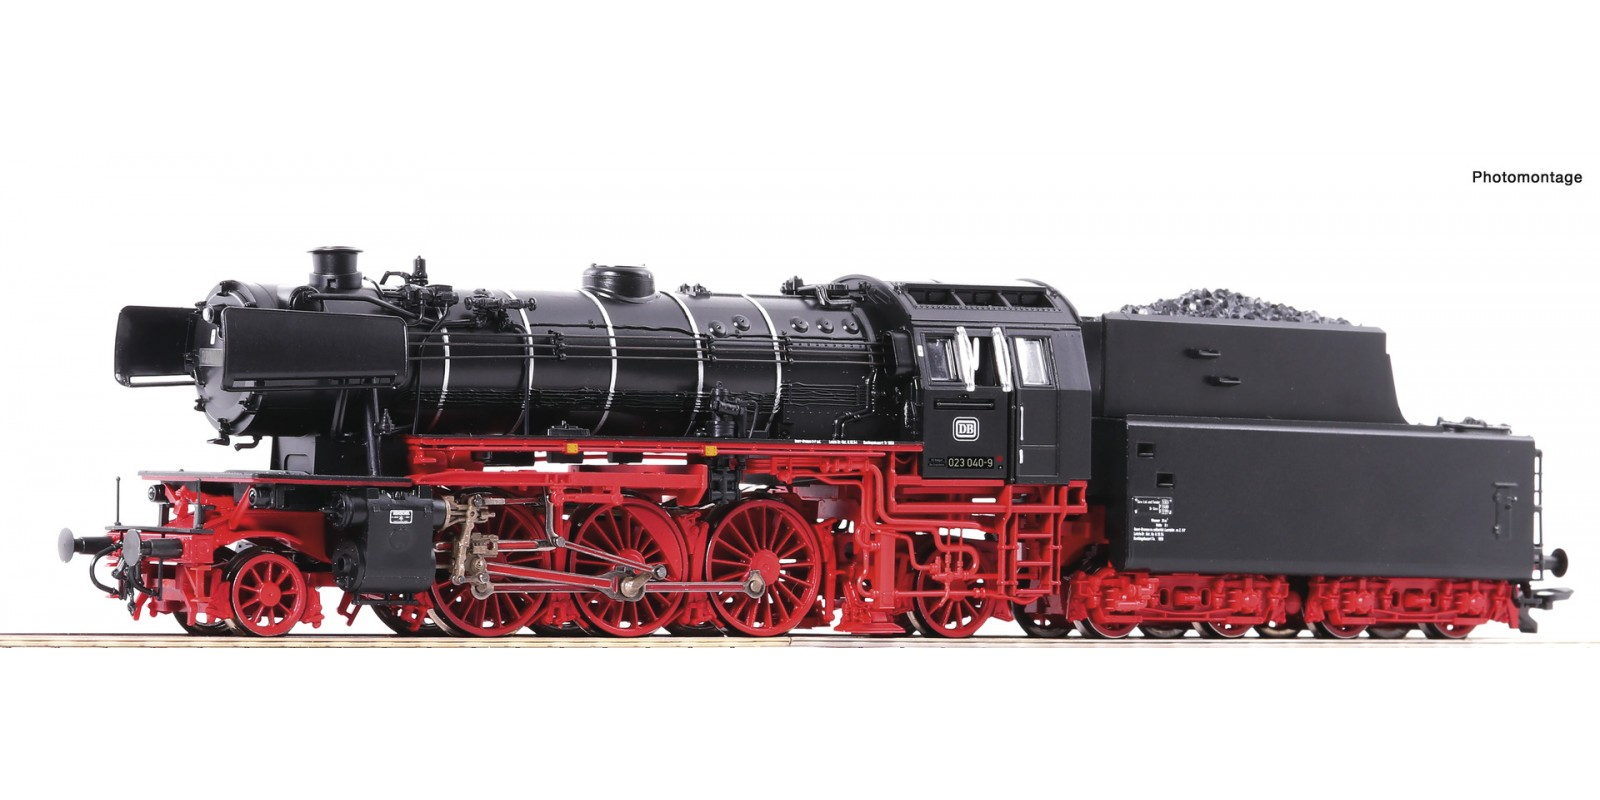 RO70250 Steam locomotive 023 040-9